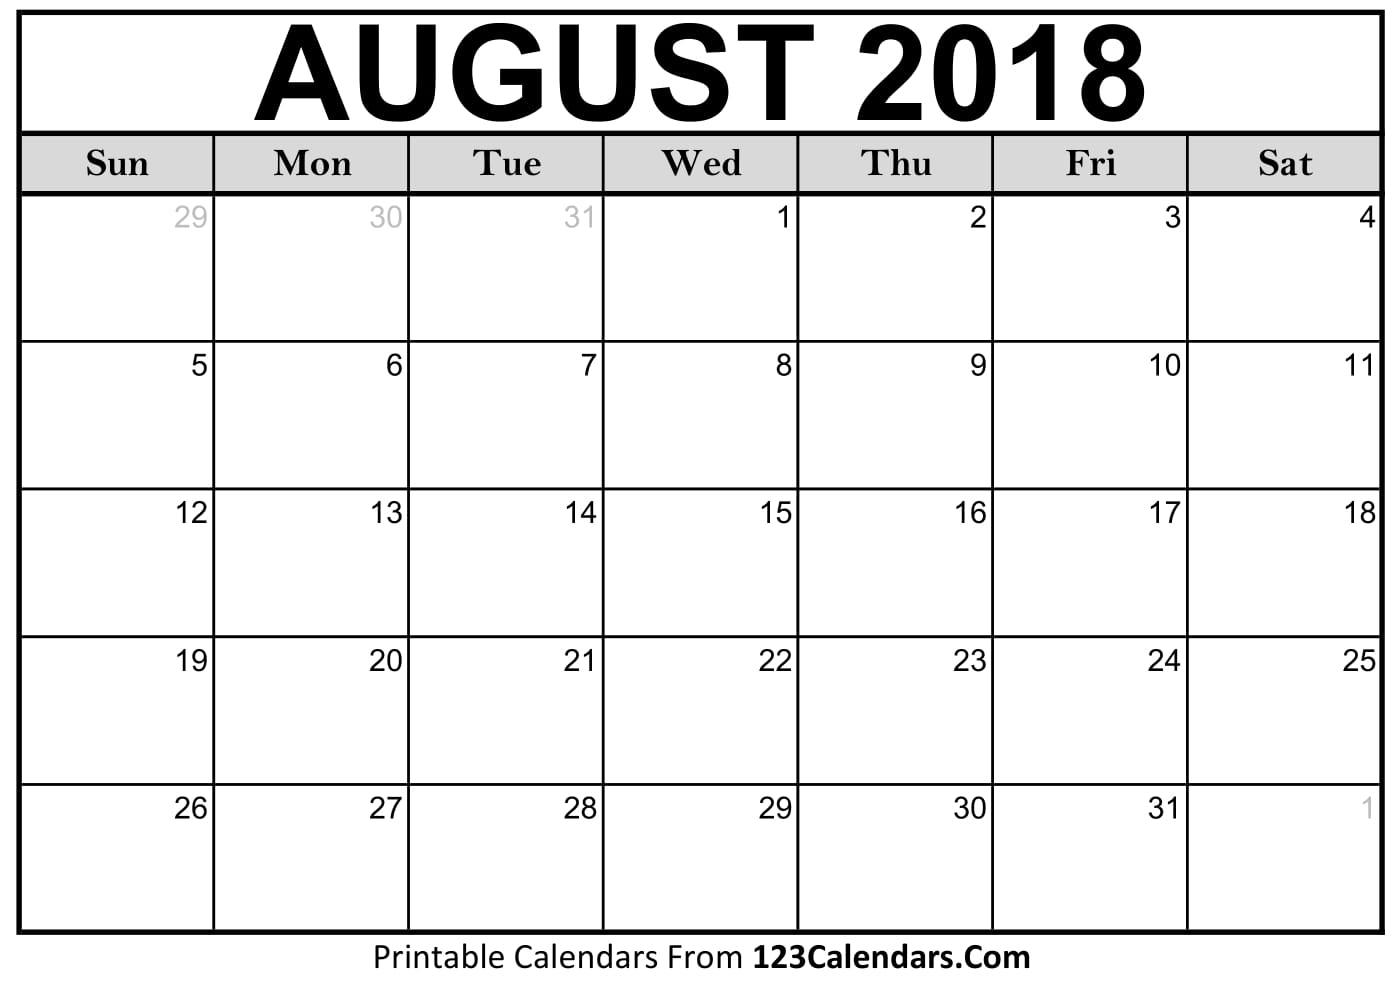 Printable Calendar 2018 For August | Printable Calendar 2019